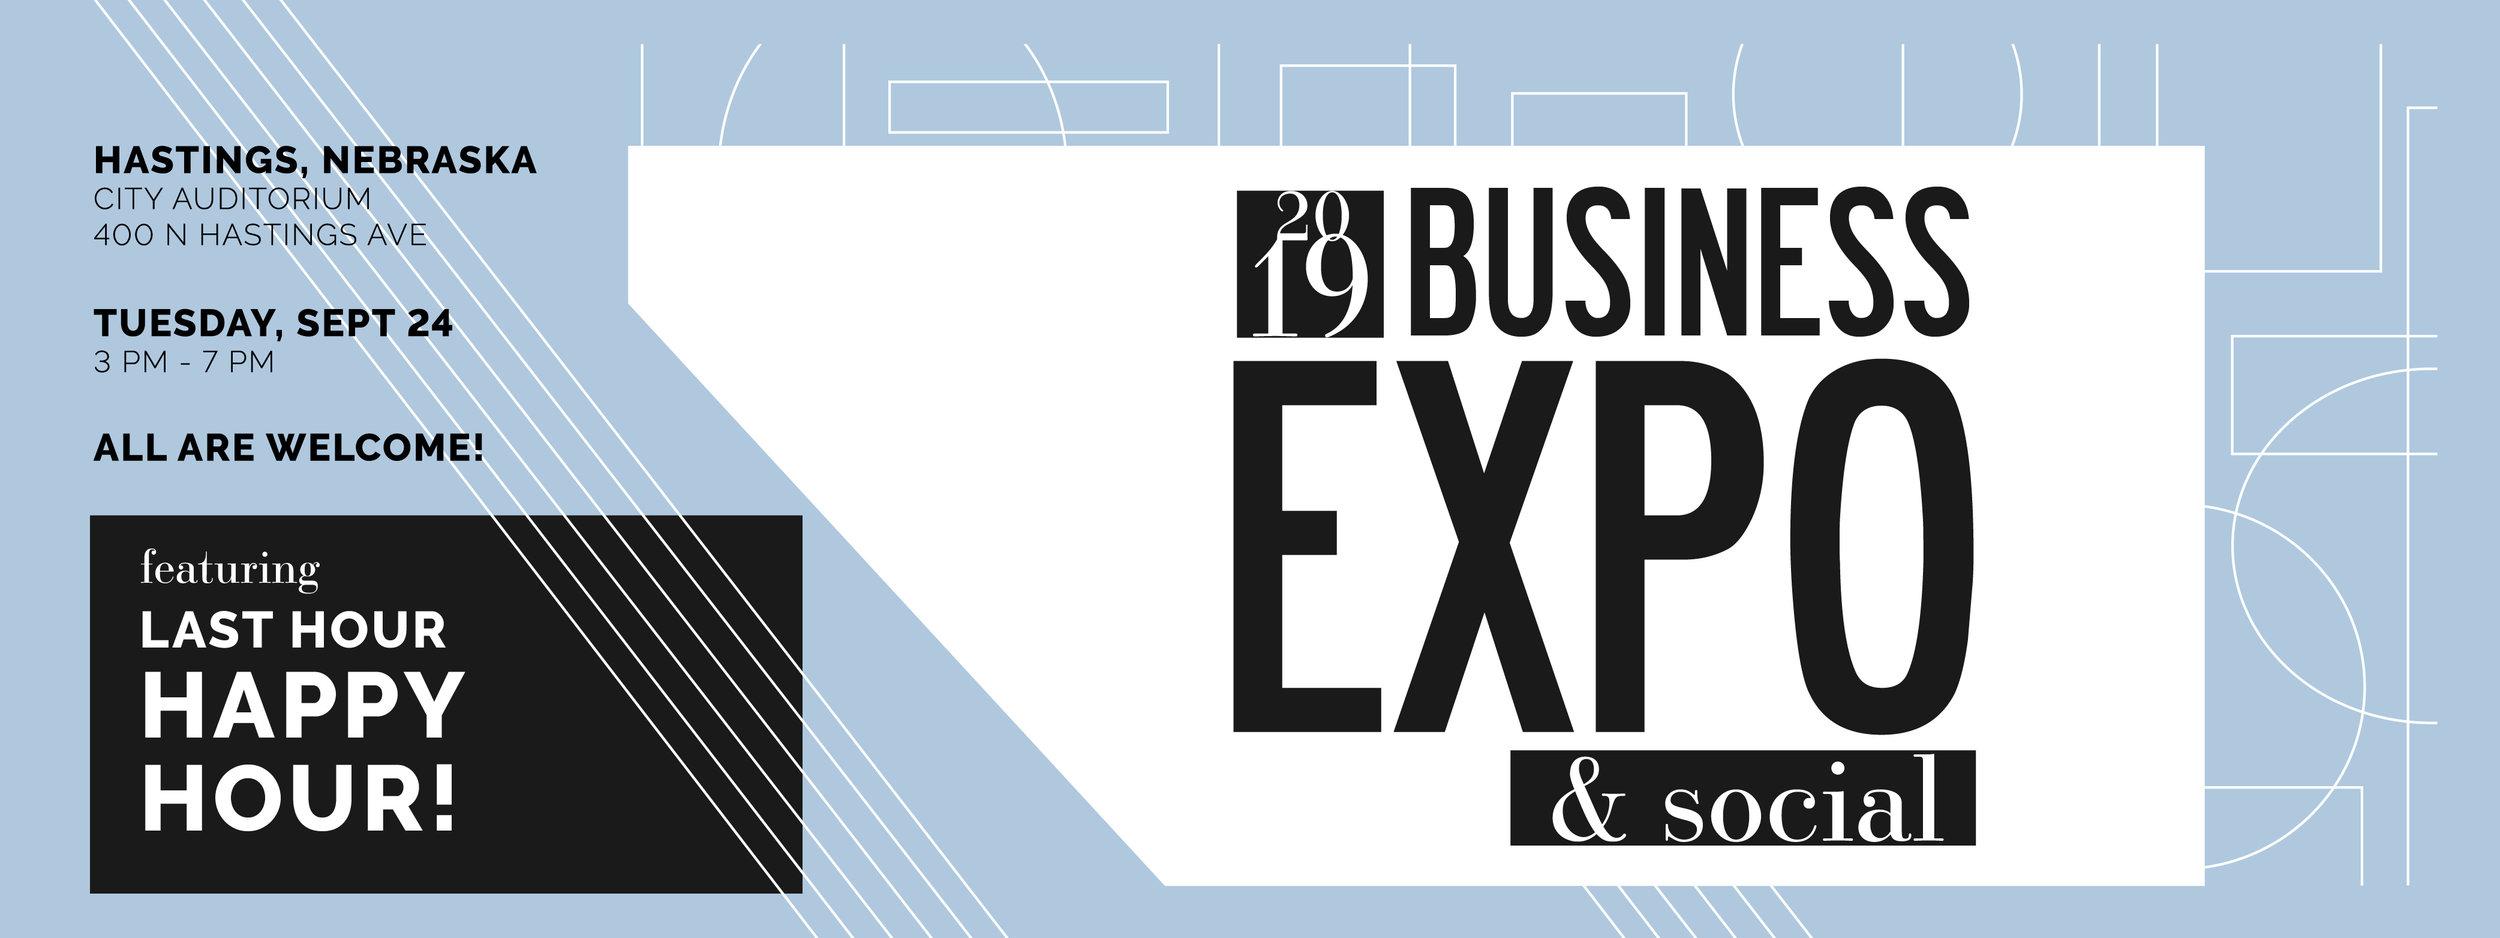 Business Expo 2019-03.jpg